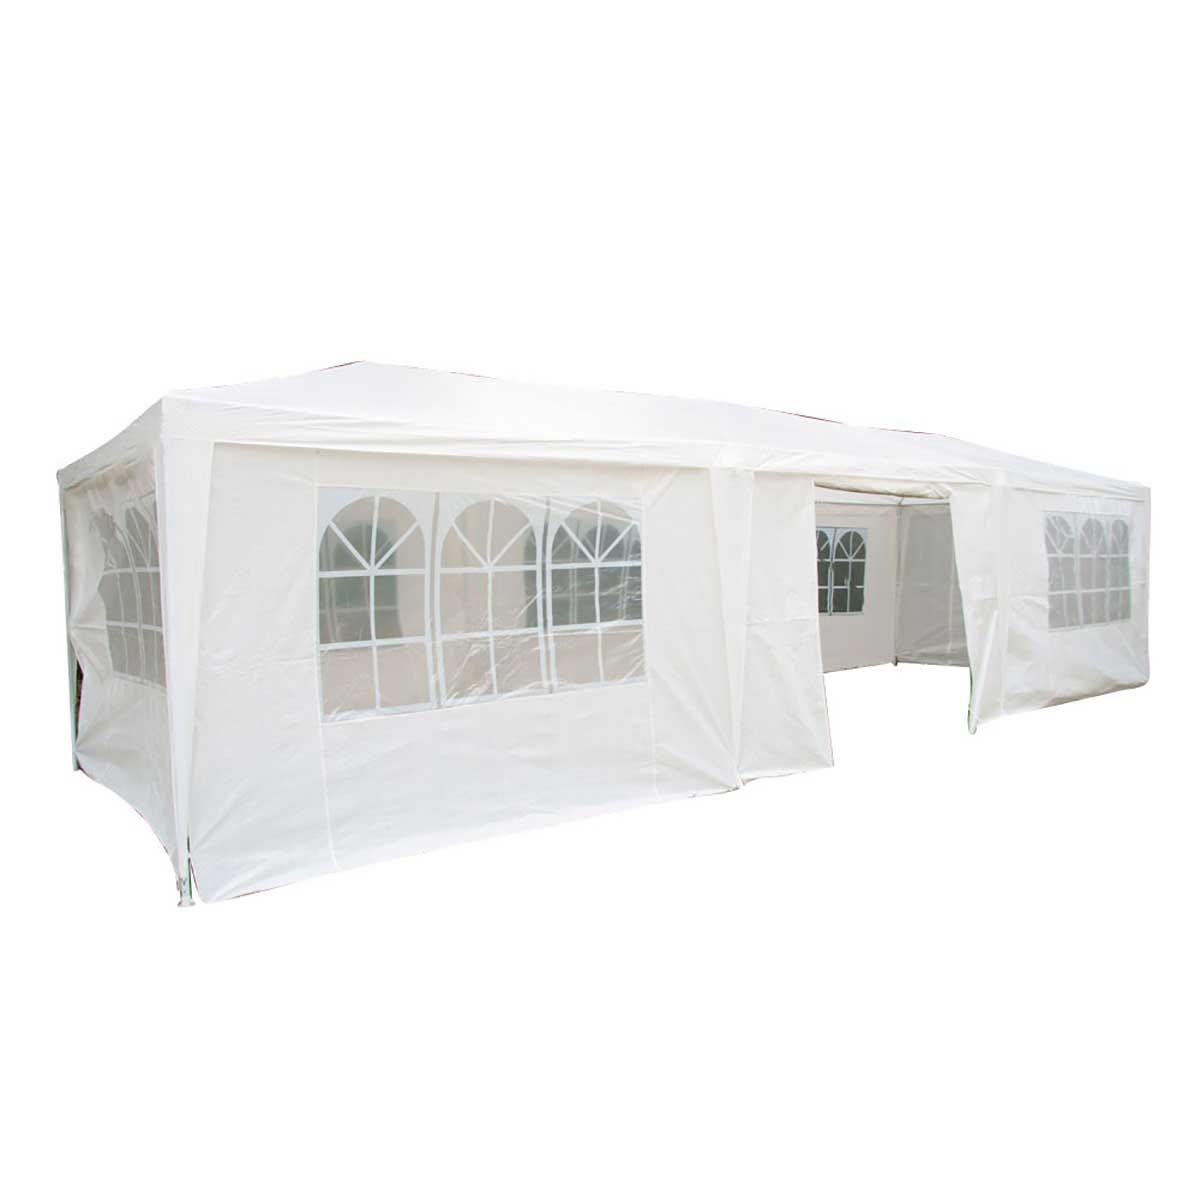 Airwave 9m x 3m Value Party Tent Gazebo - White